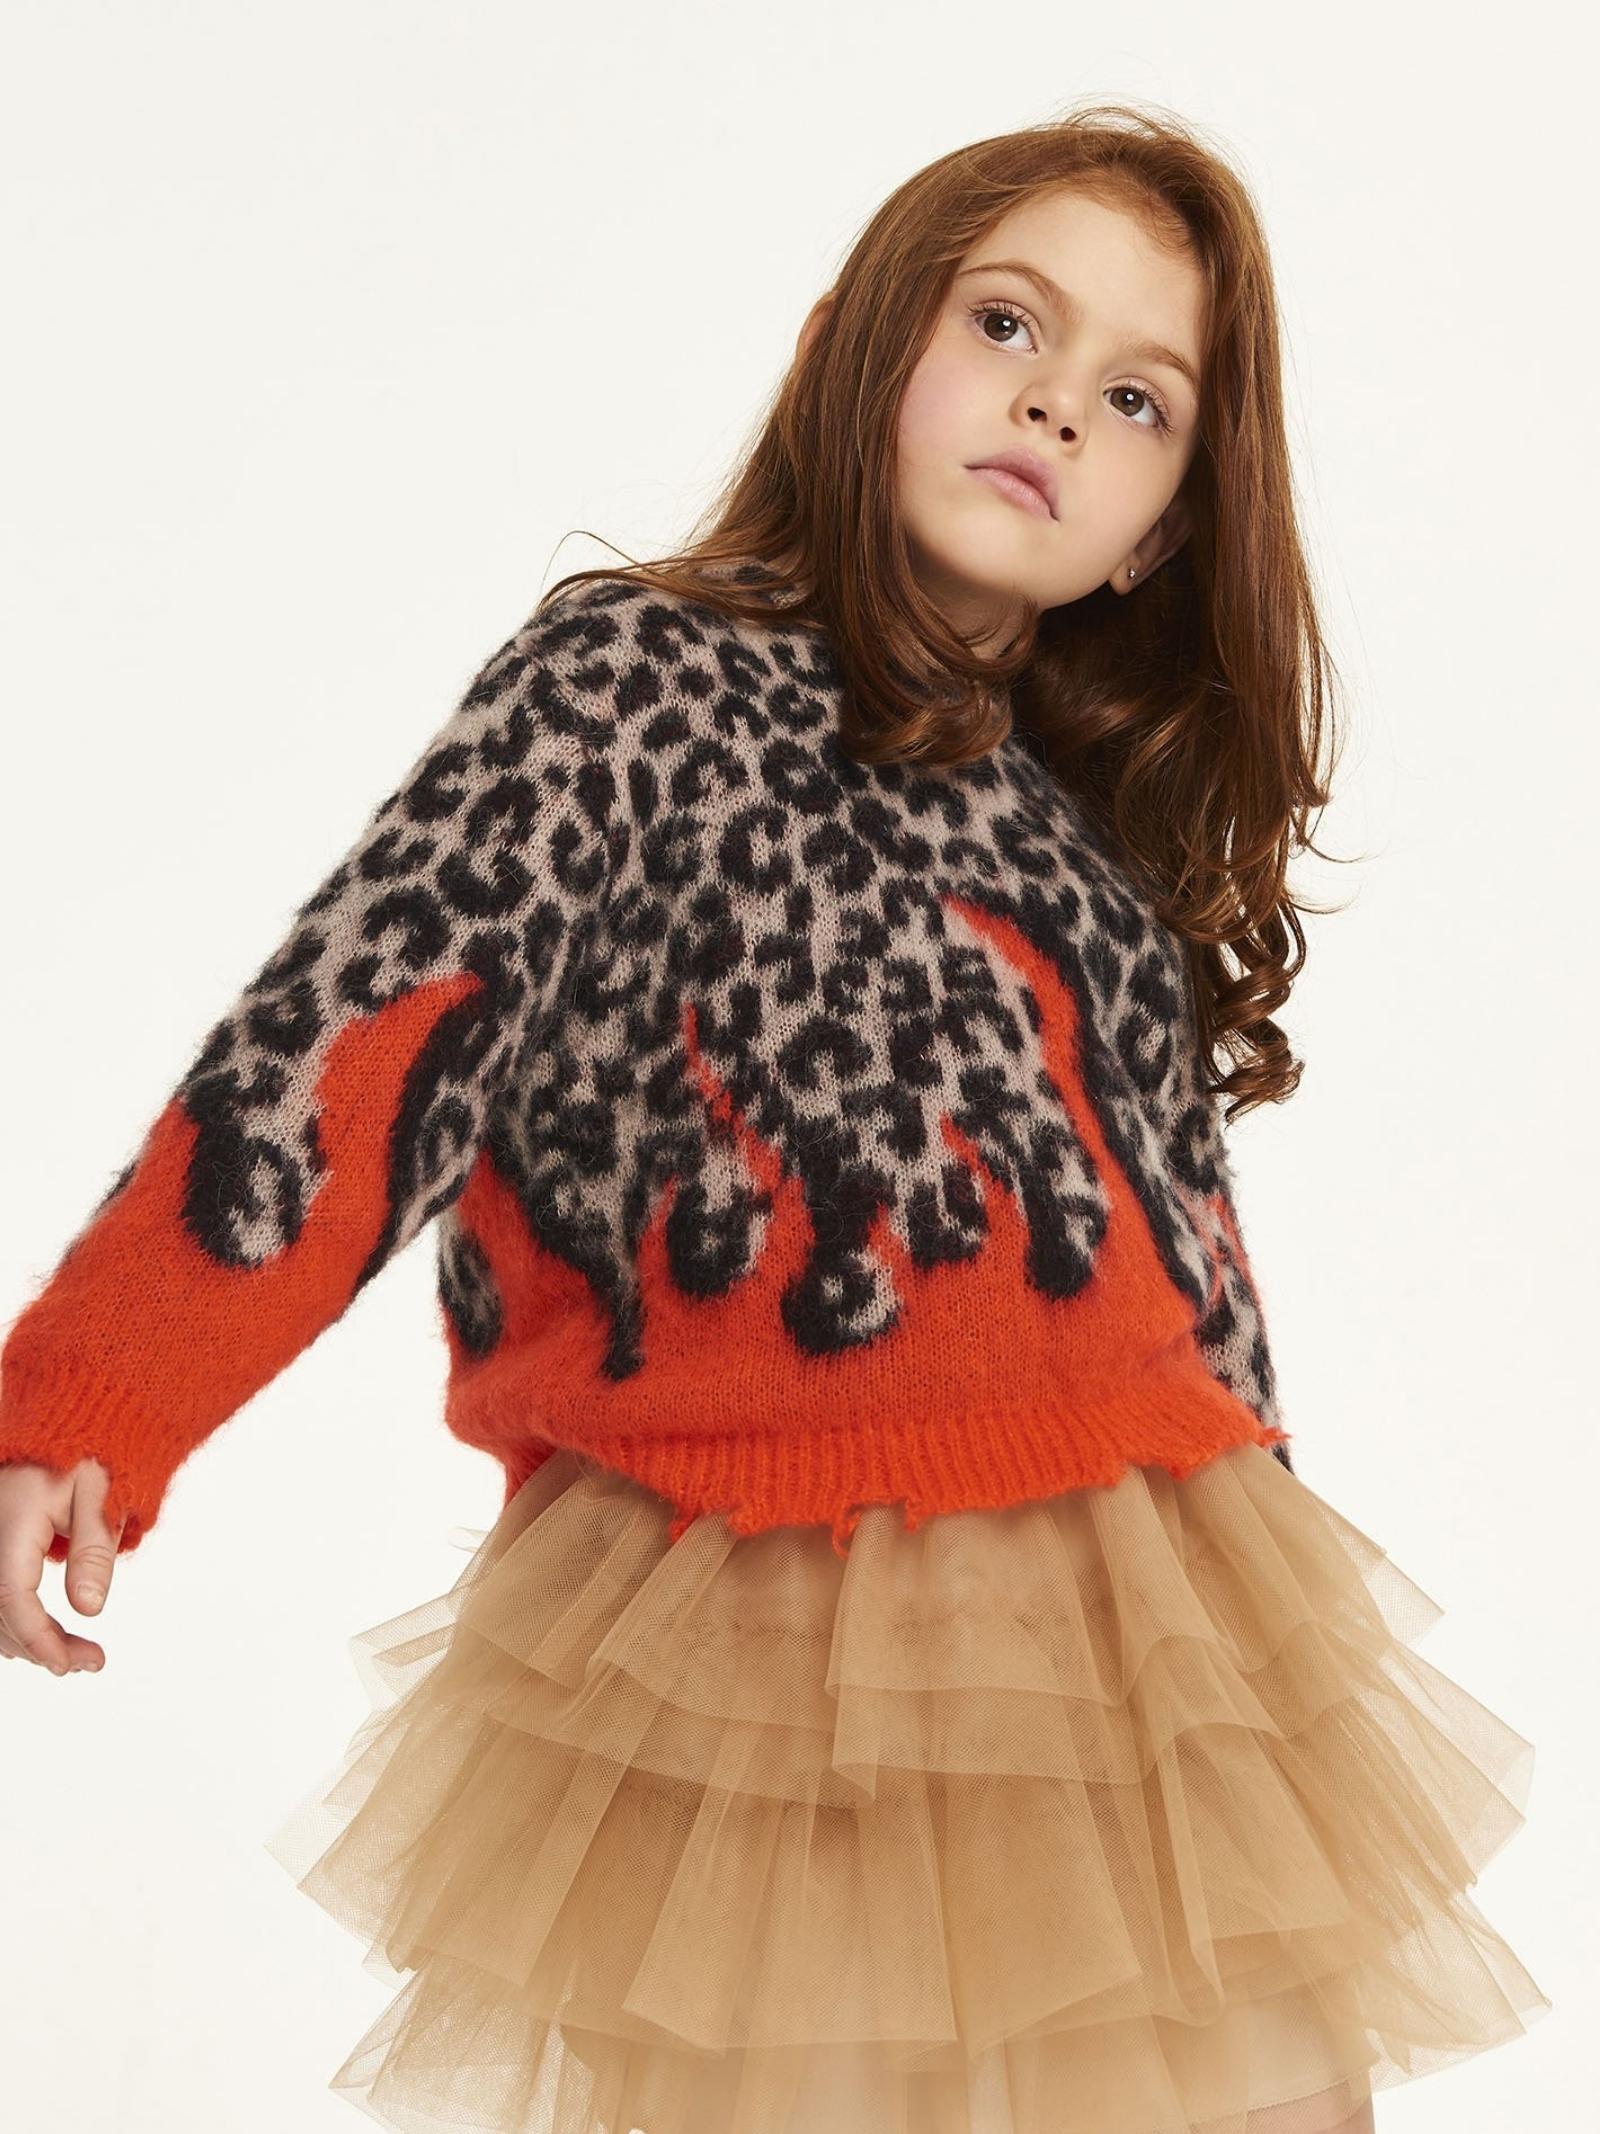 Girl Printed Sweater ANIYE BY GIRL | Sweaters | 11110402039